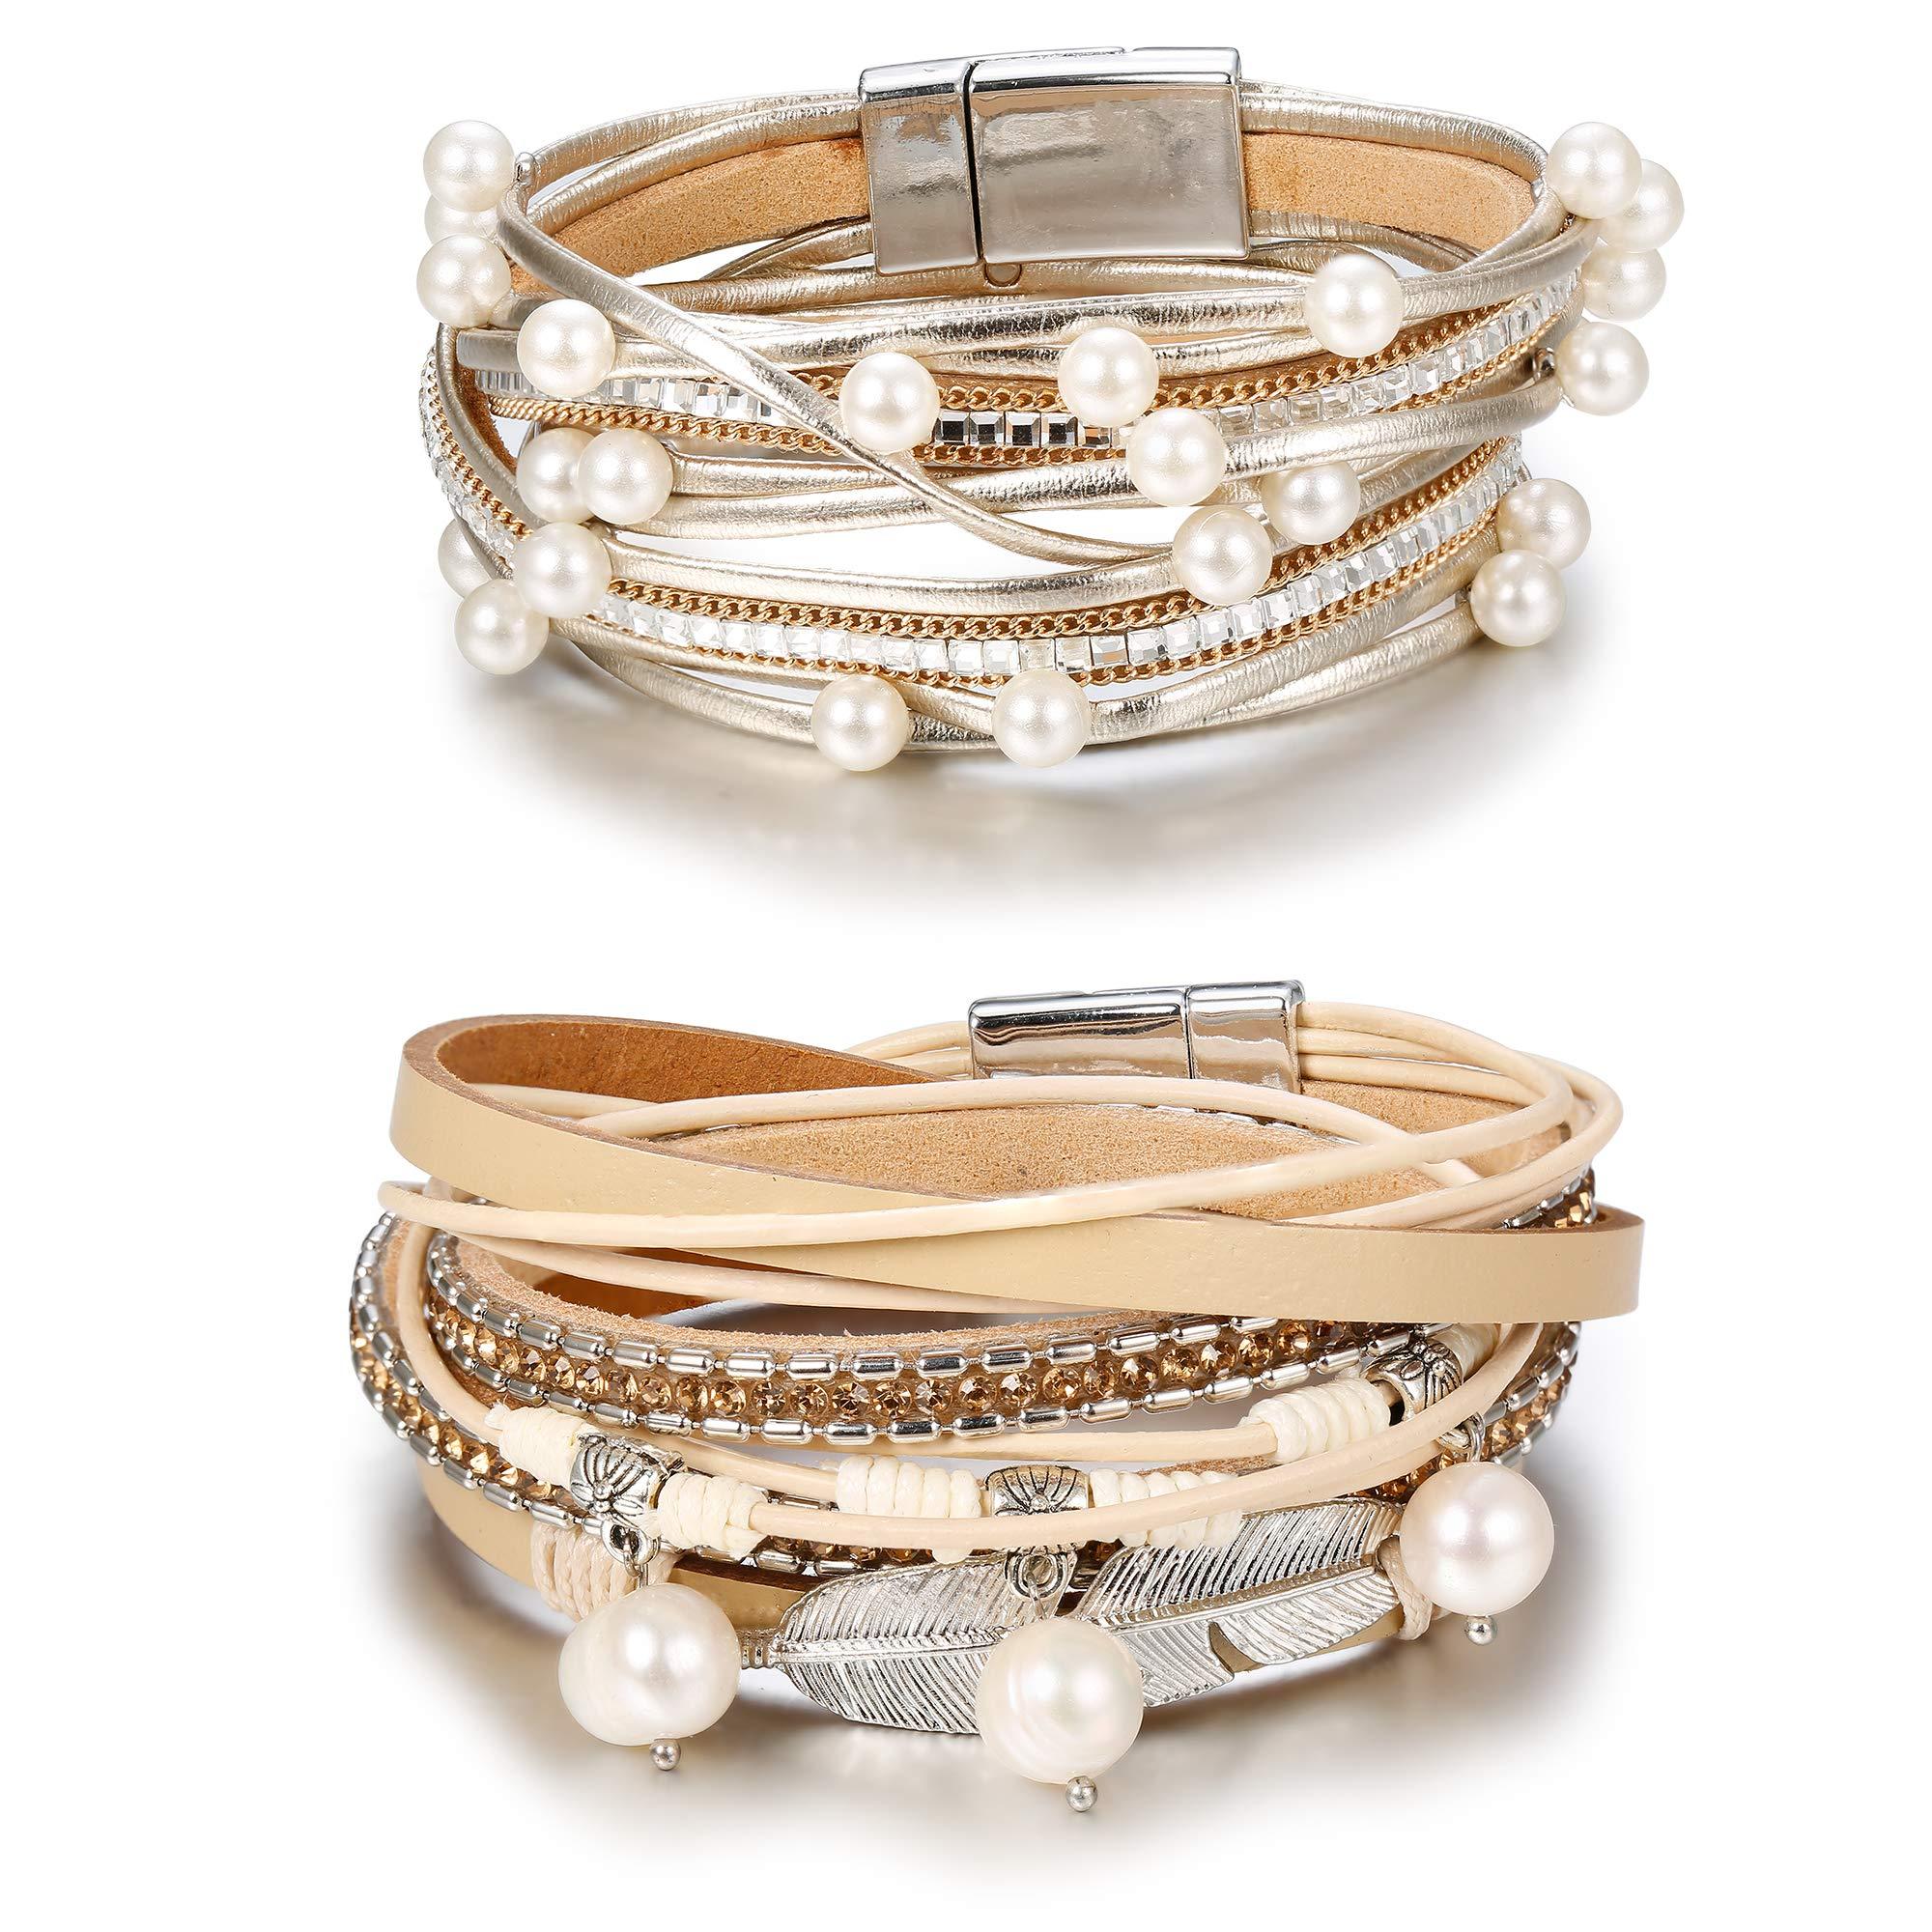 Hanpabum 2Pcs Multilayer Leather Wrap Bracelets Women Girls Boho Magnetic Clasp Bangle Bracelets Set (A)